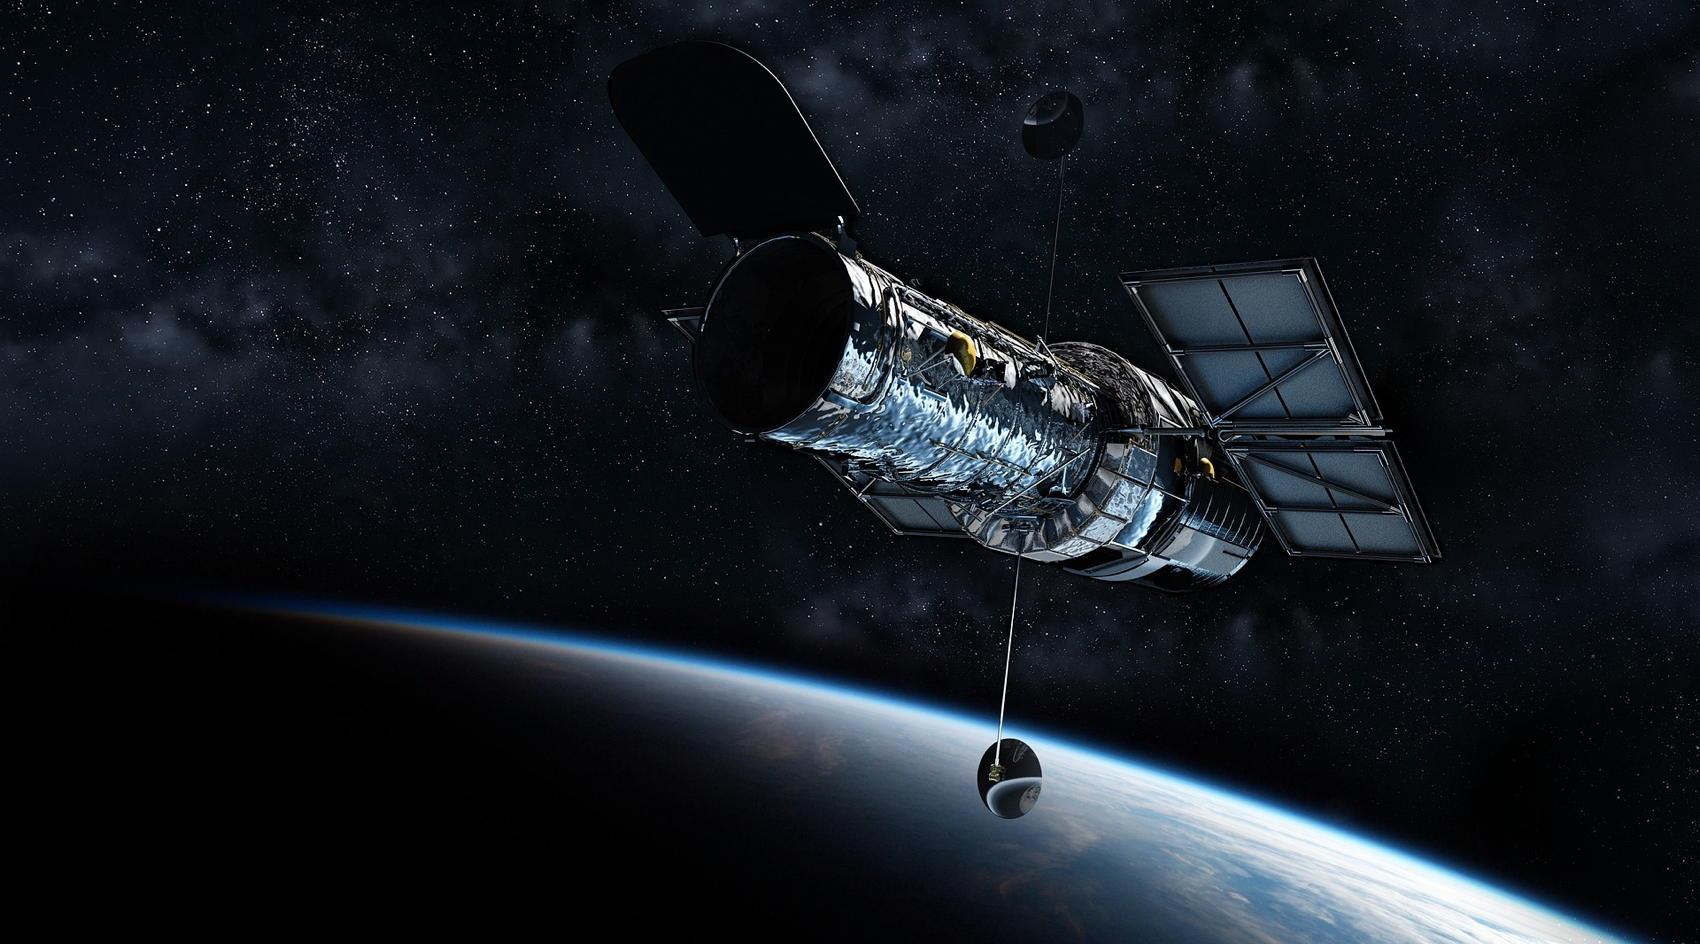 Hubble Telescope Against the Cosmos - Image by Ondřej Šponiar